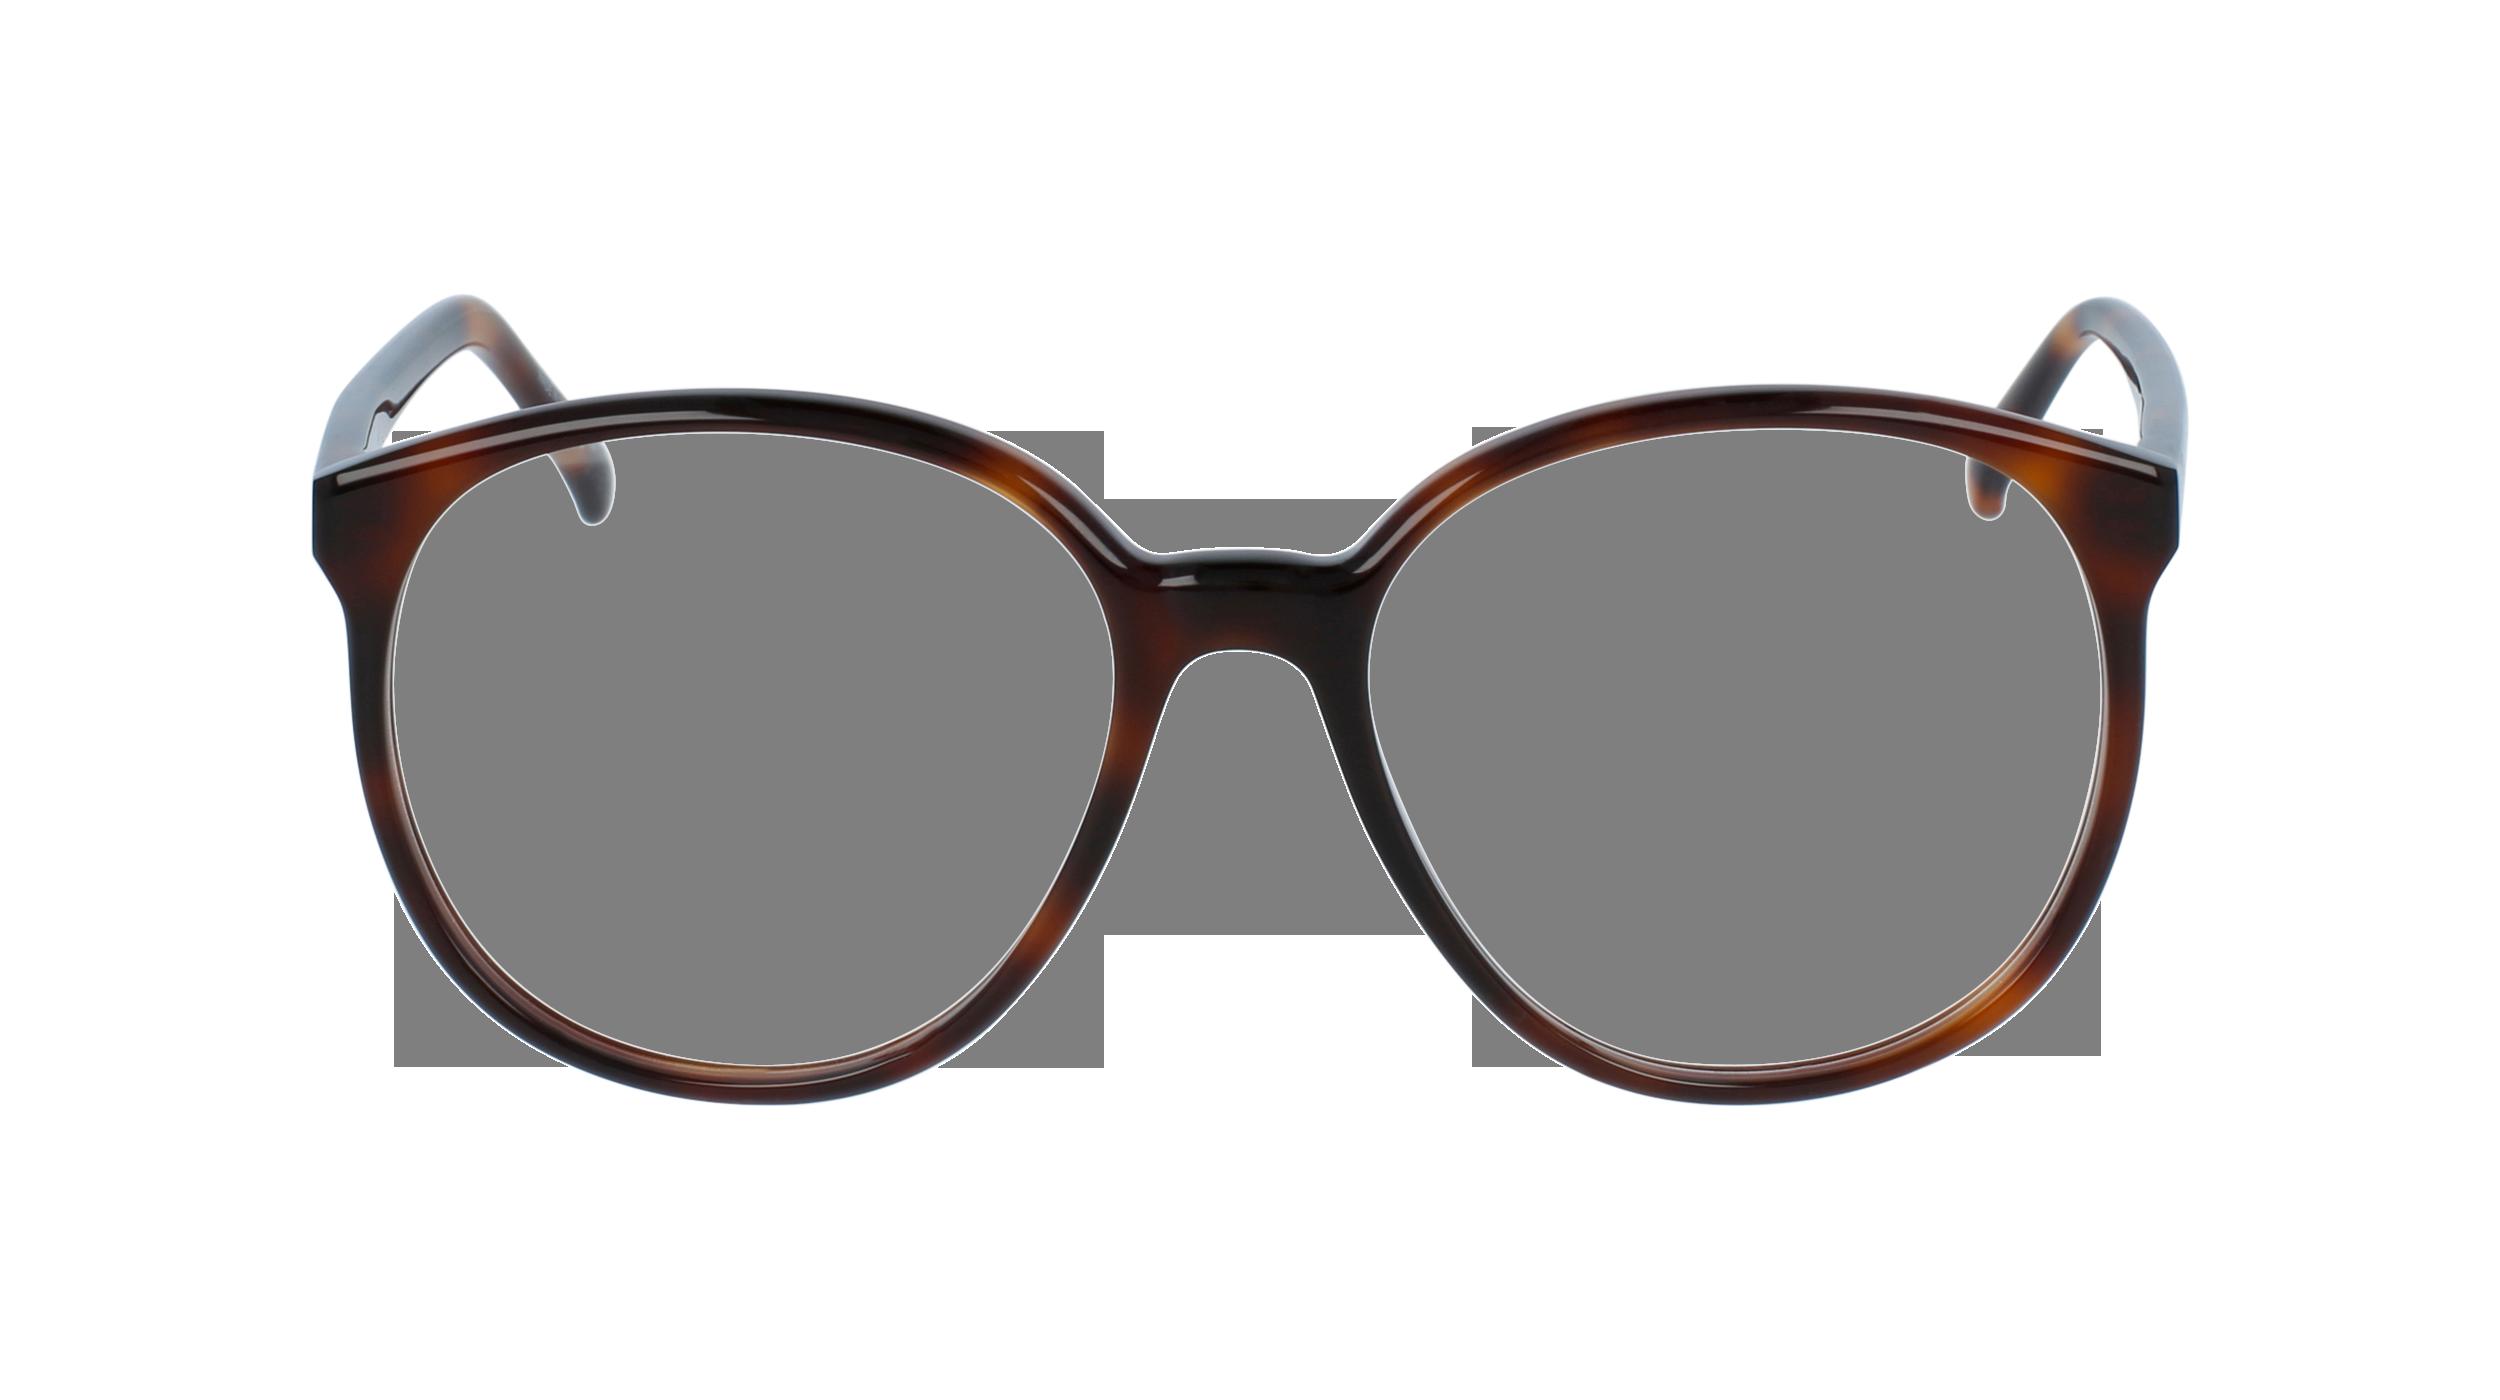 Optic2000 Lunettes Givenchy